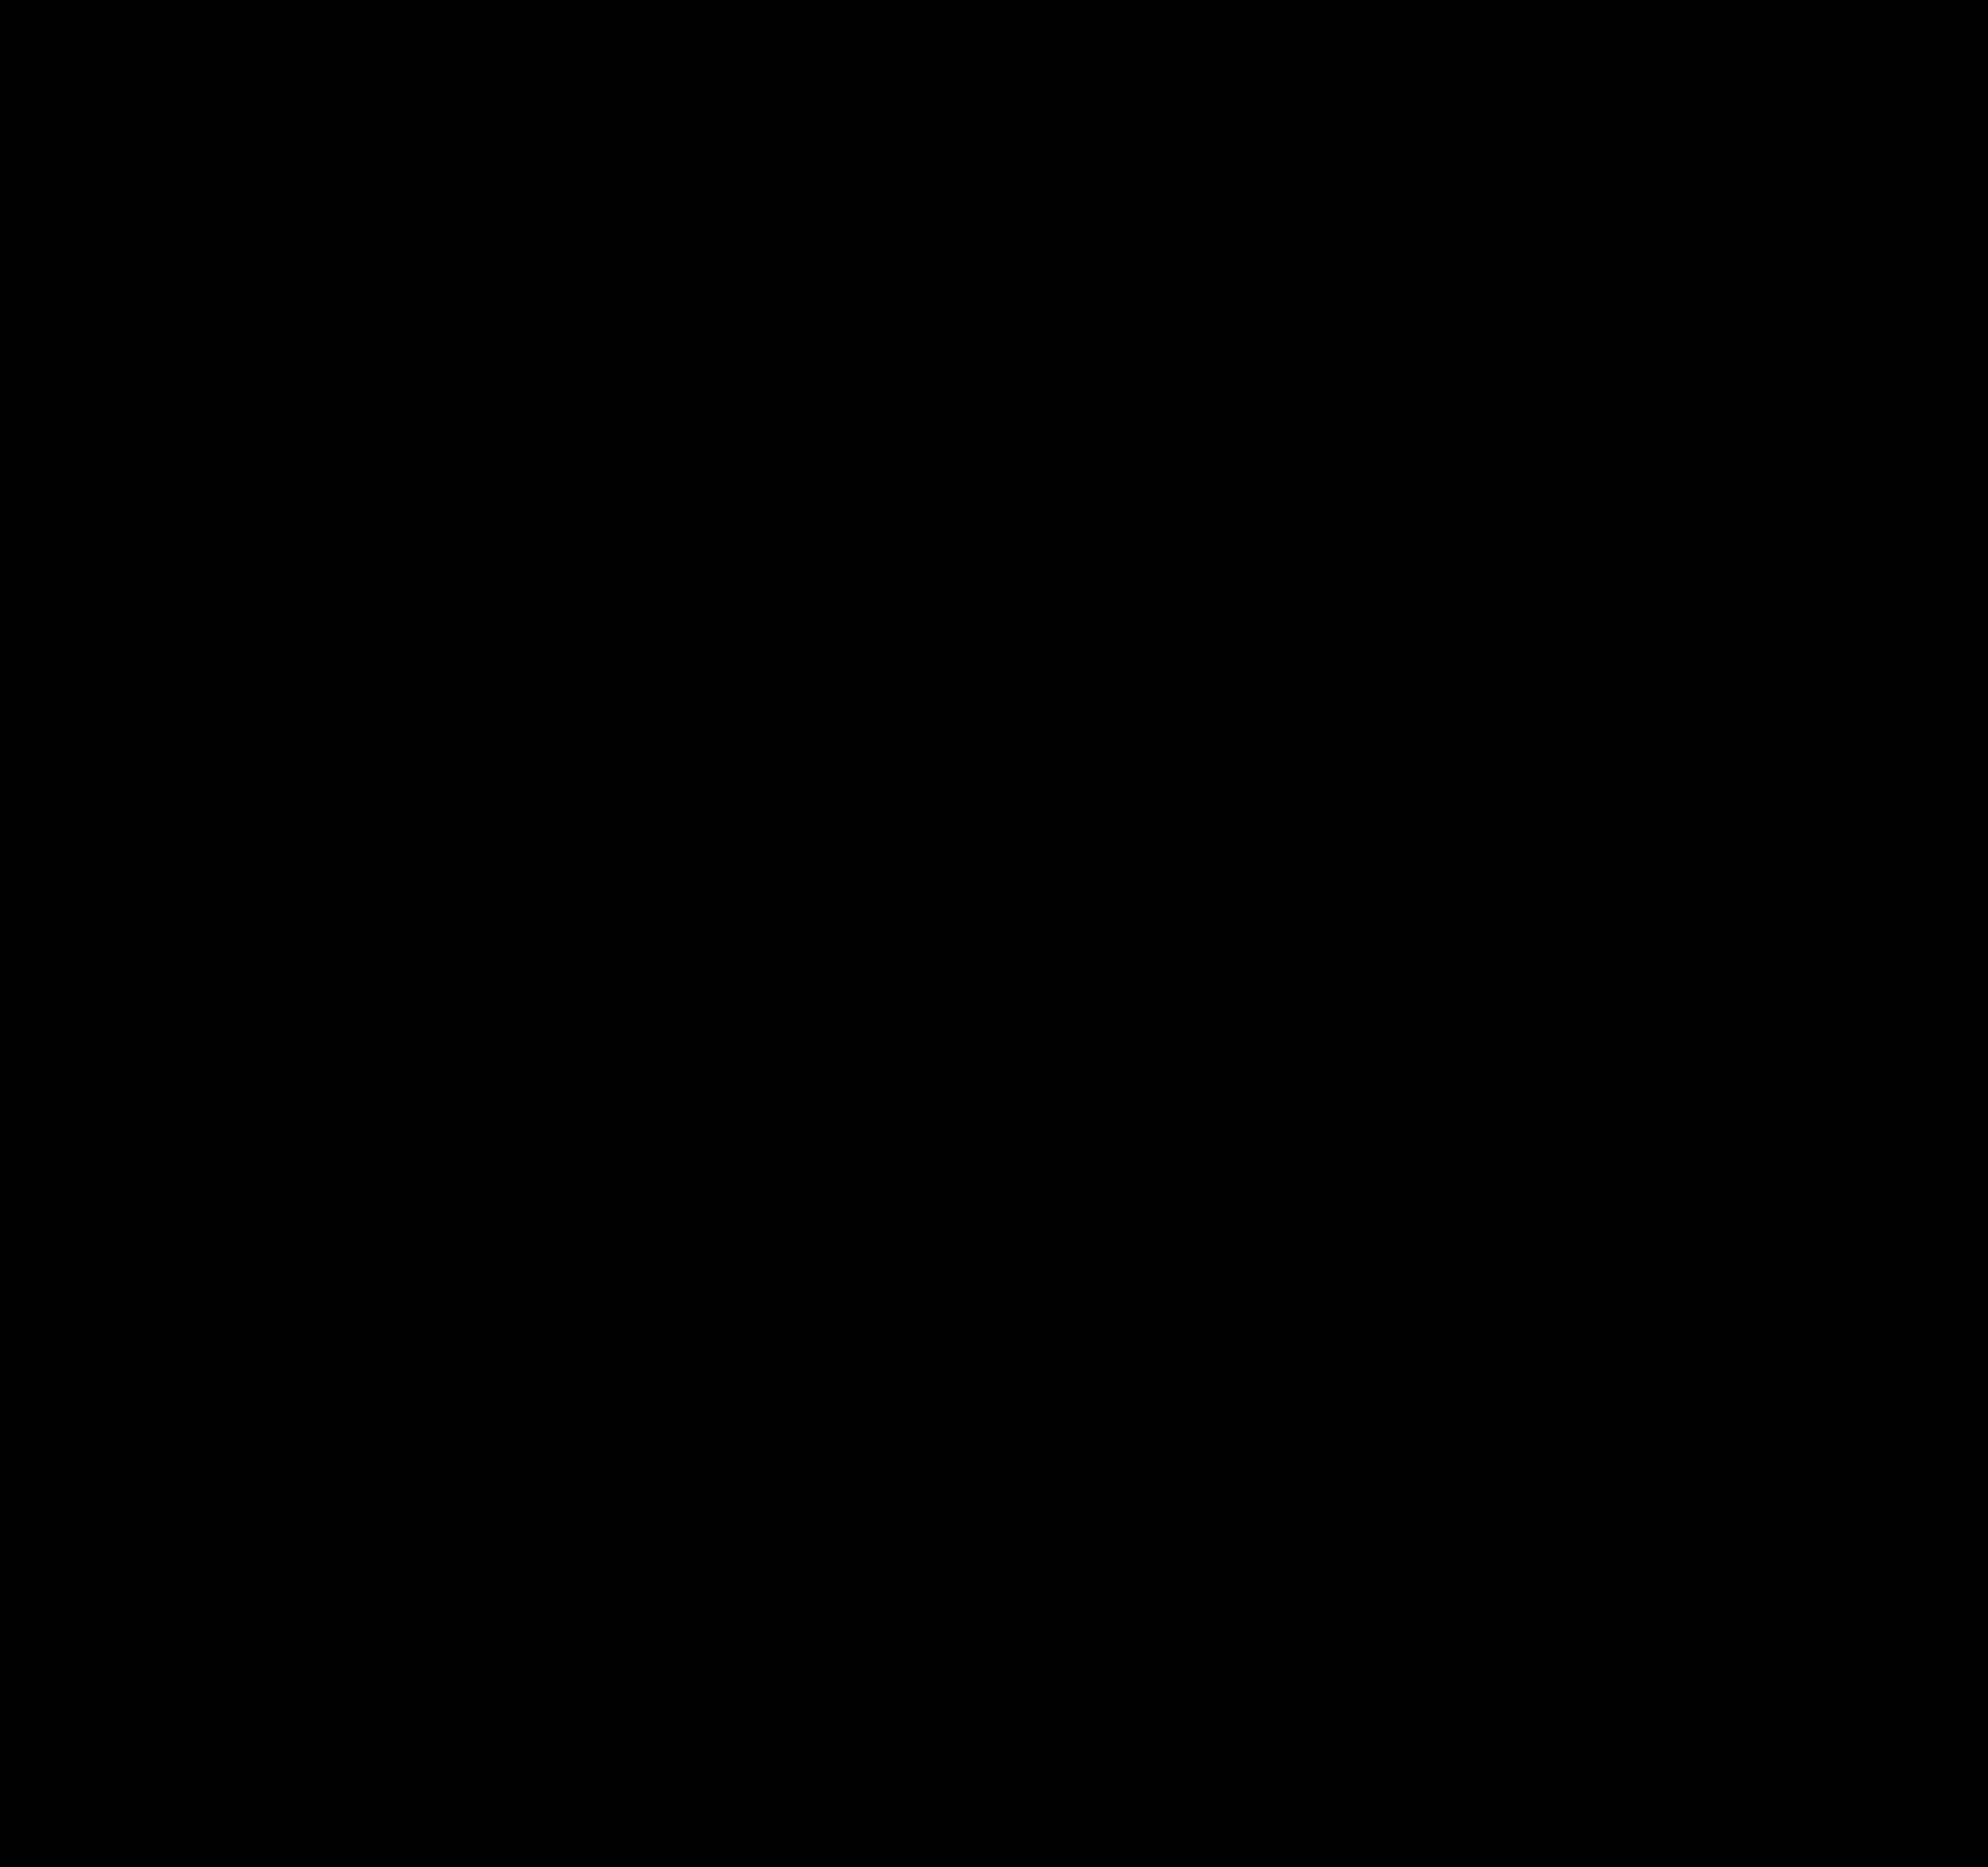 2324x2182 Clipart